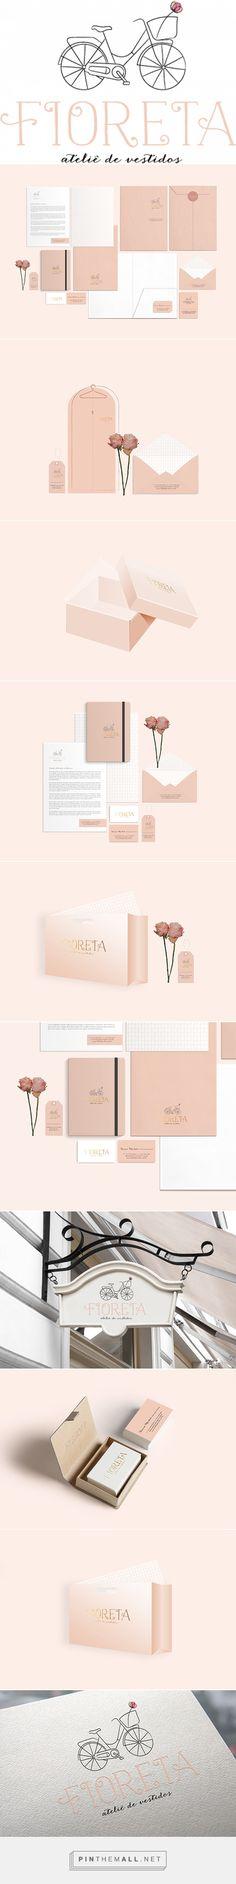 Fioreta Bridal and Formal Wear Atelier by Estudio Quadrilatero | Fivestar Branding Agency – Design and Branding Agency & Curated Inspiration Gallery